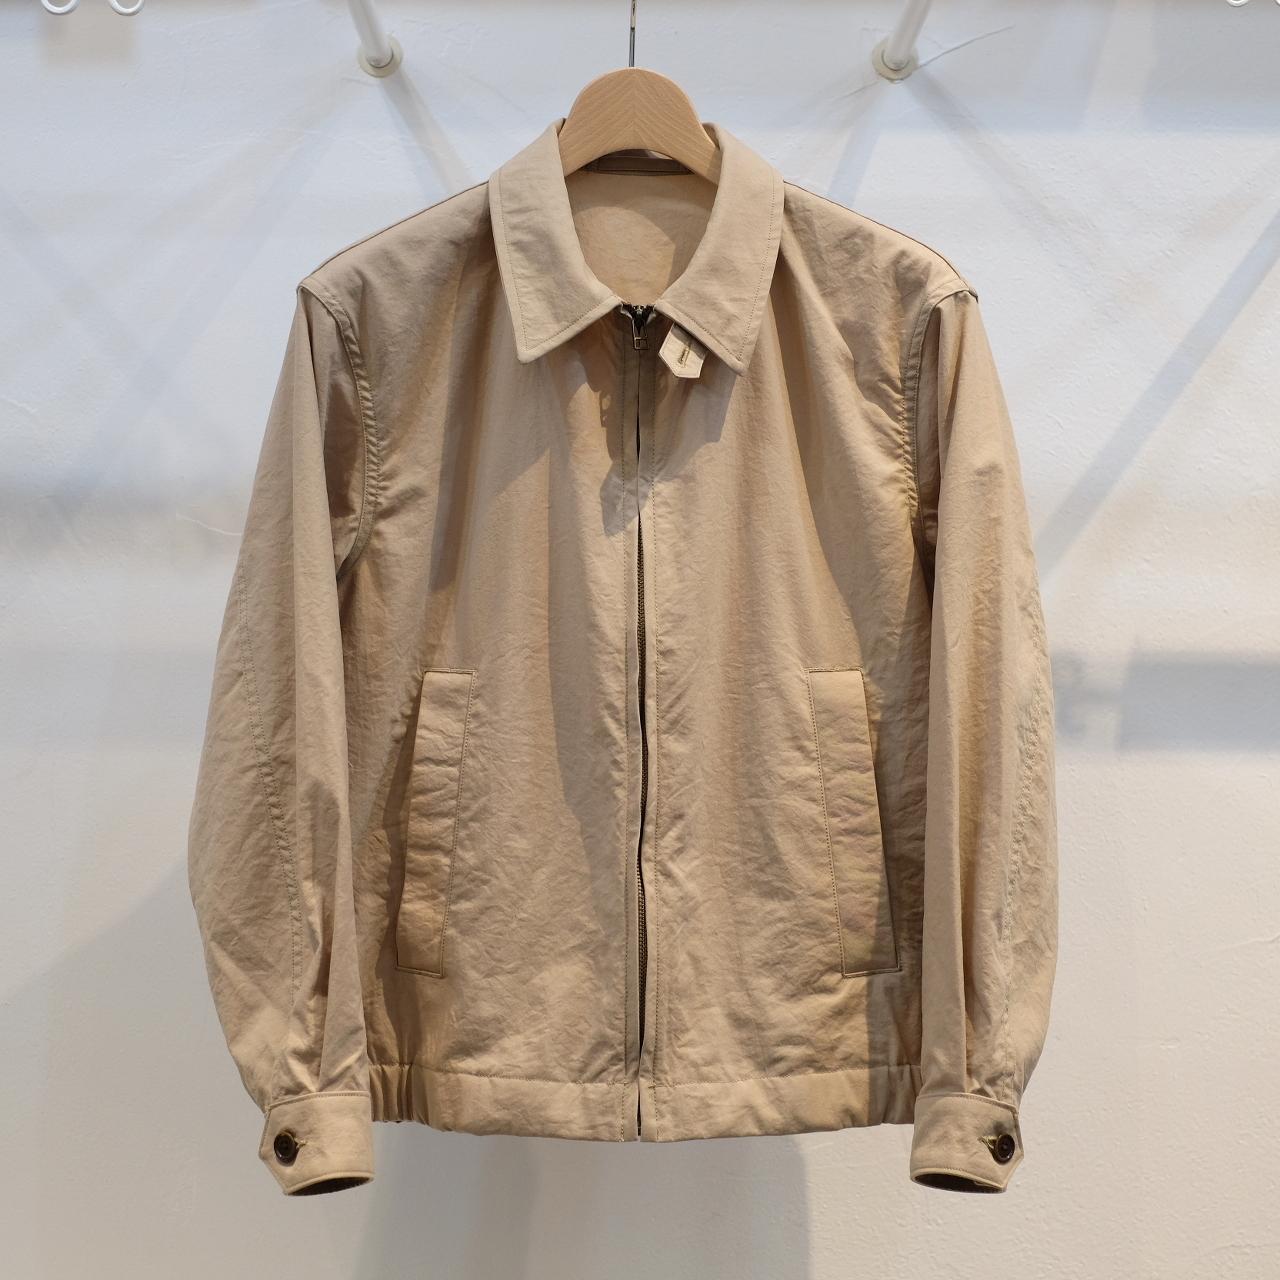 KUON(クオン) オニベジ天然染料染めナイロン ハリントンジャケット ベージュ